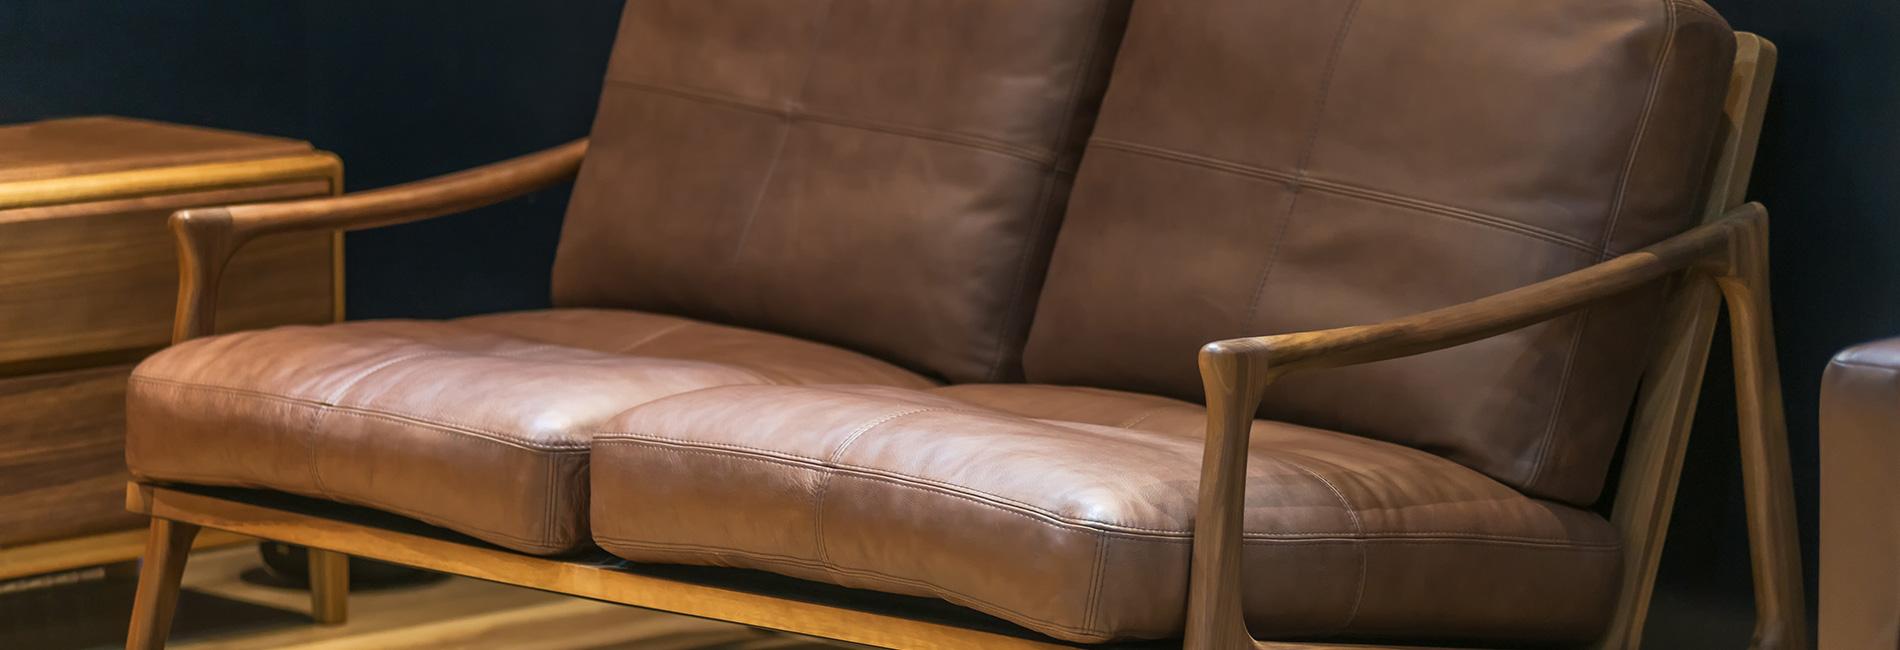 Leather Furniture Repair In San Diego, CA